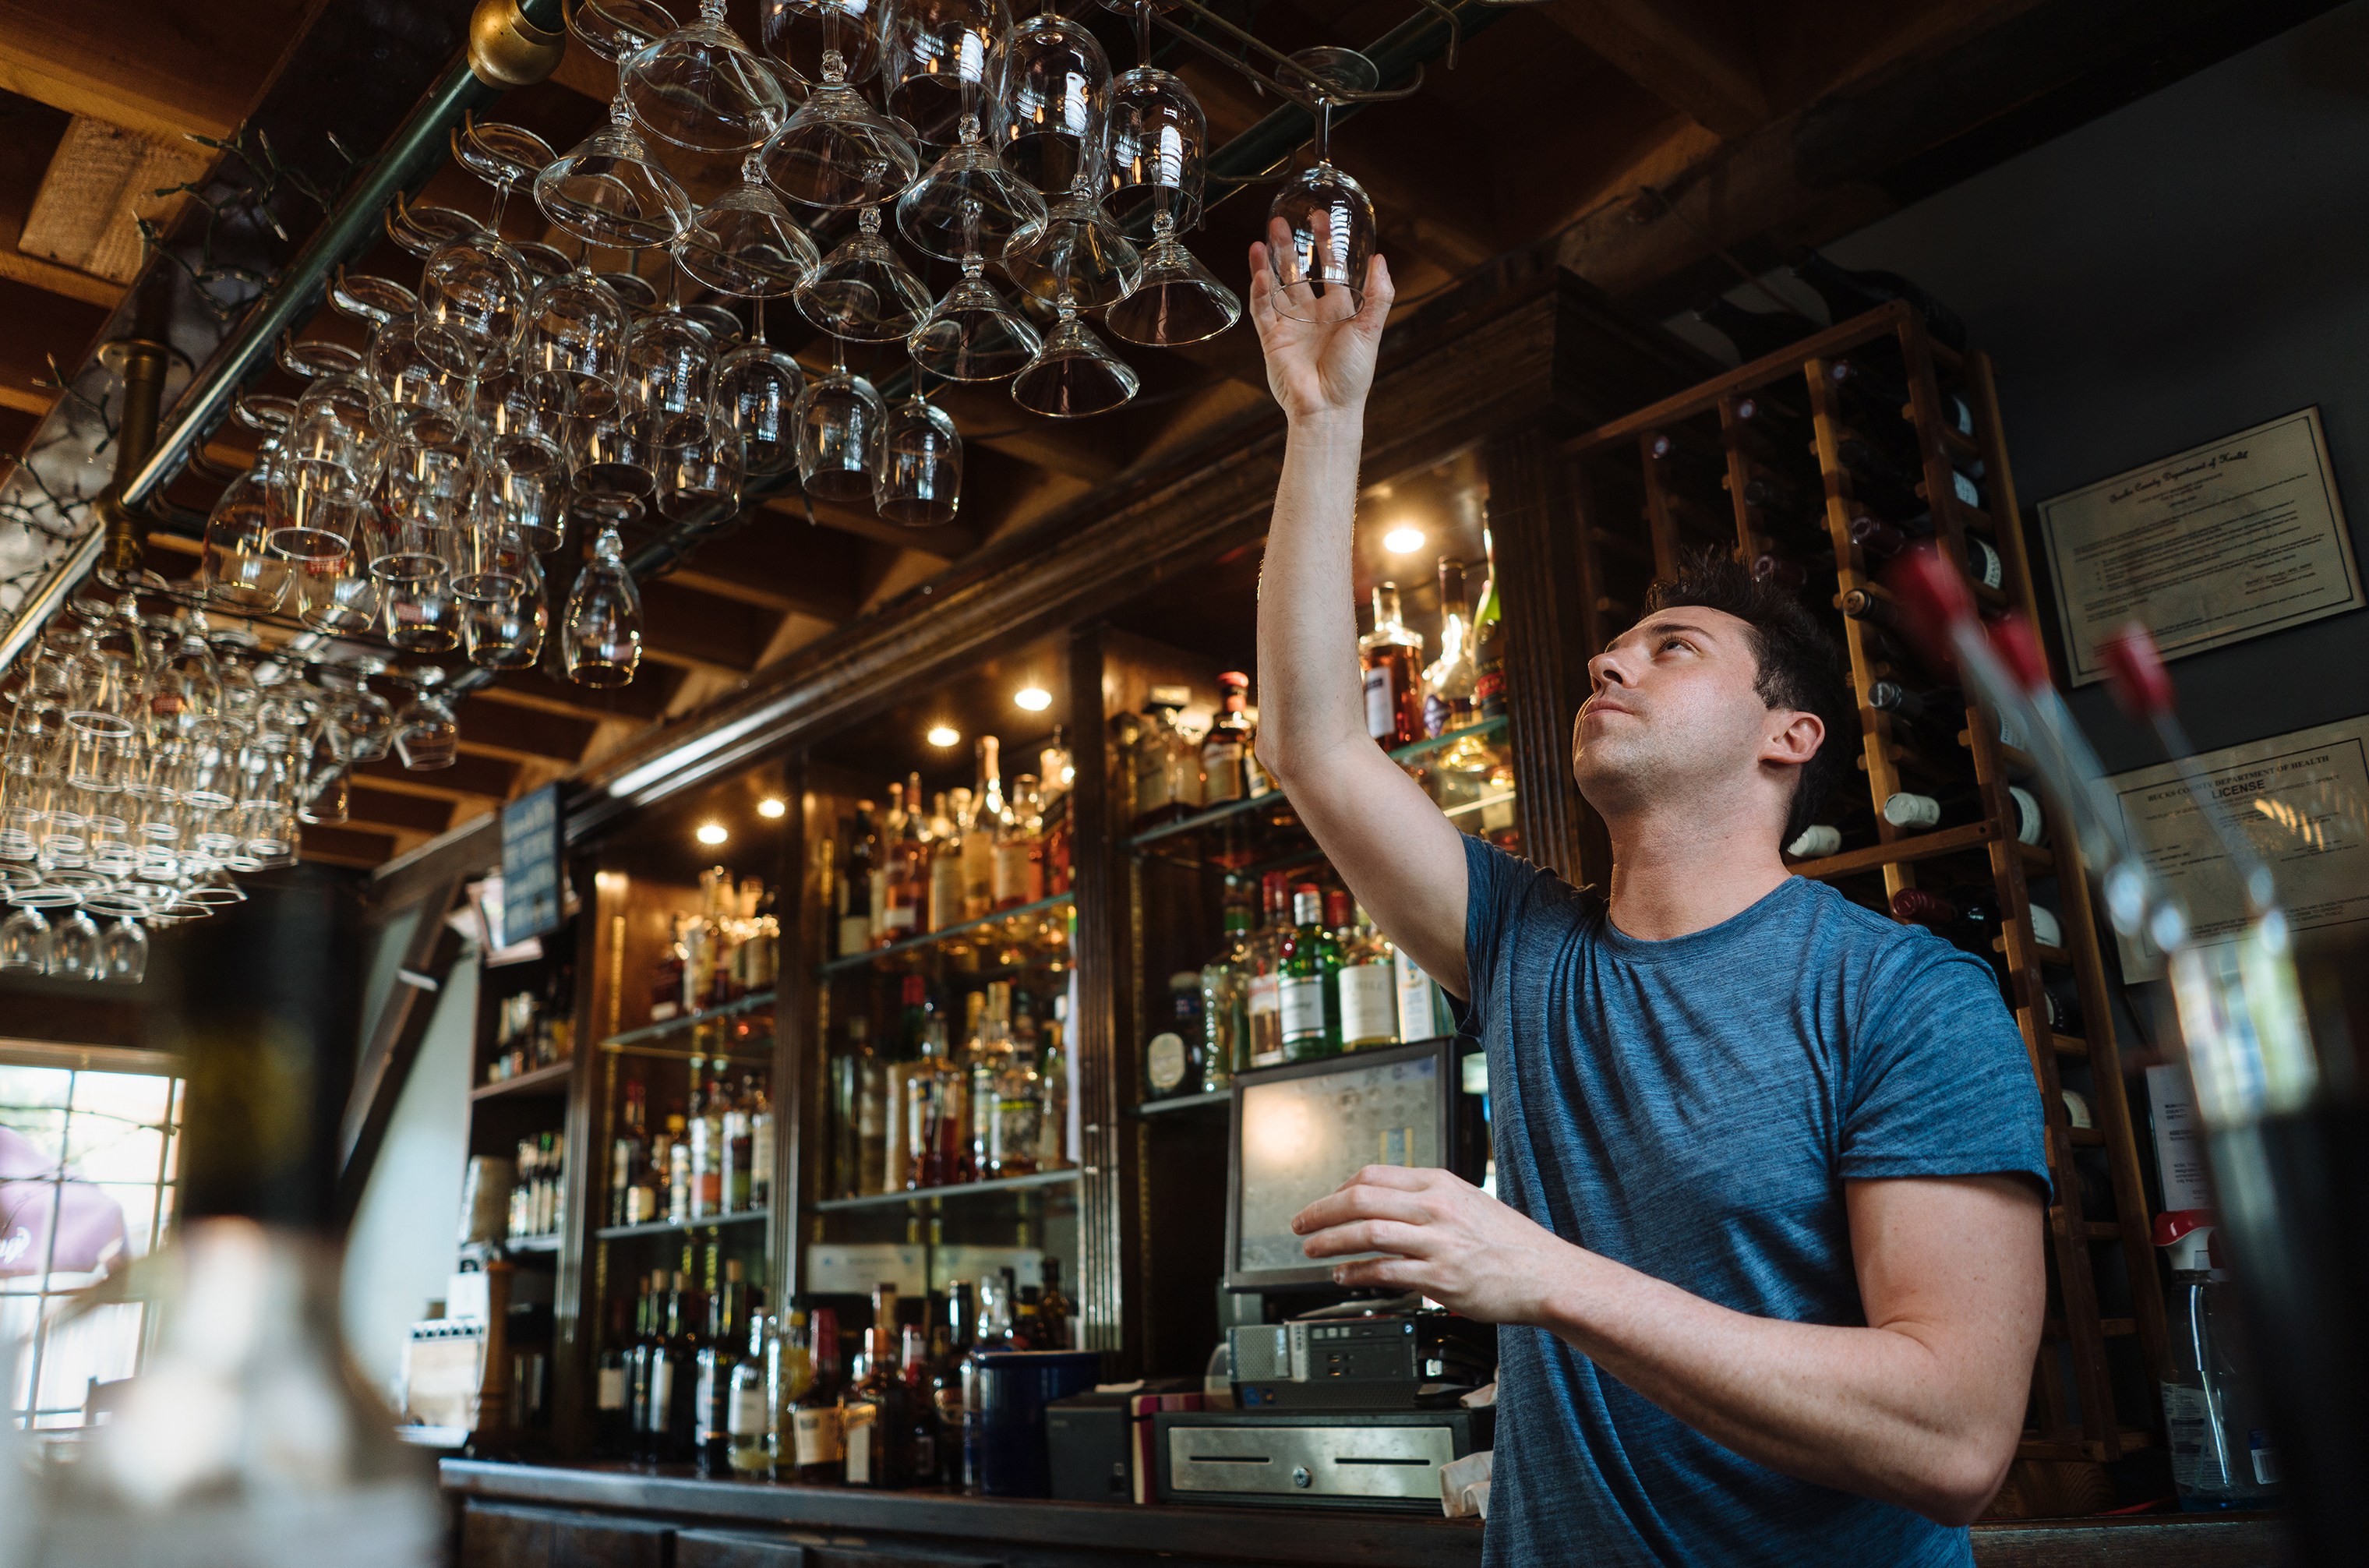 Bryan Steinberg bartending at Martine's RiverHouse Restaurant, New Hope, Pennsylvania, May 15, 2018.